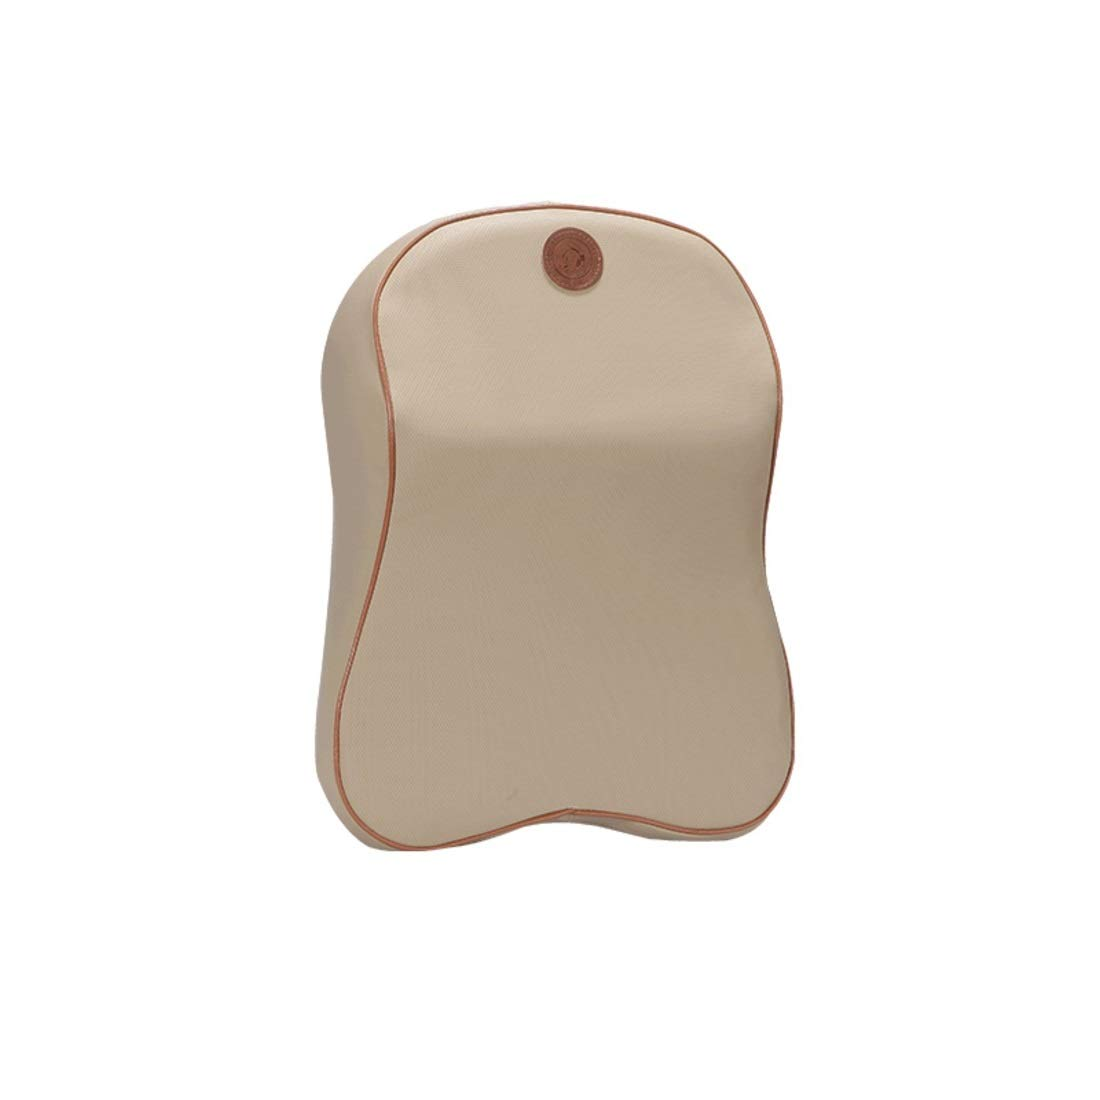 BAOYIT Leather Material Car Pillow Lumbar Memory Cotton Headrest Car Neck Pillow (Color : Beige) by BAOYIT